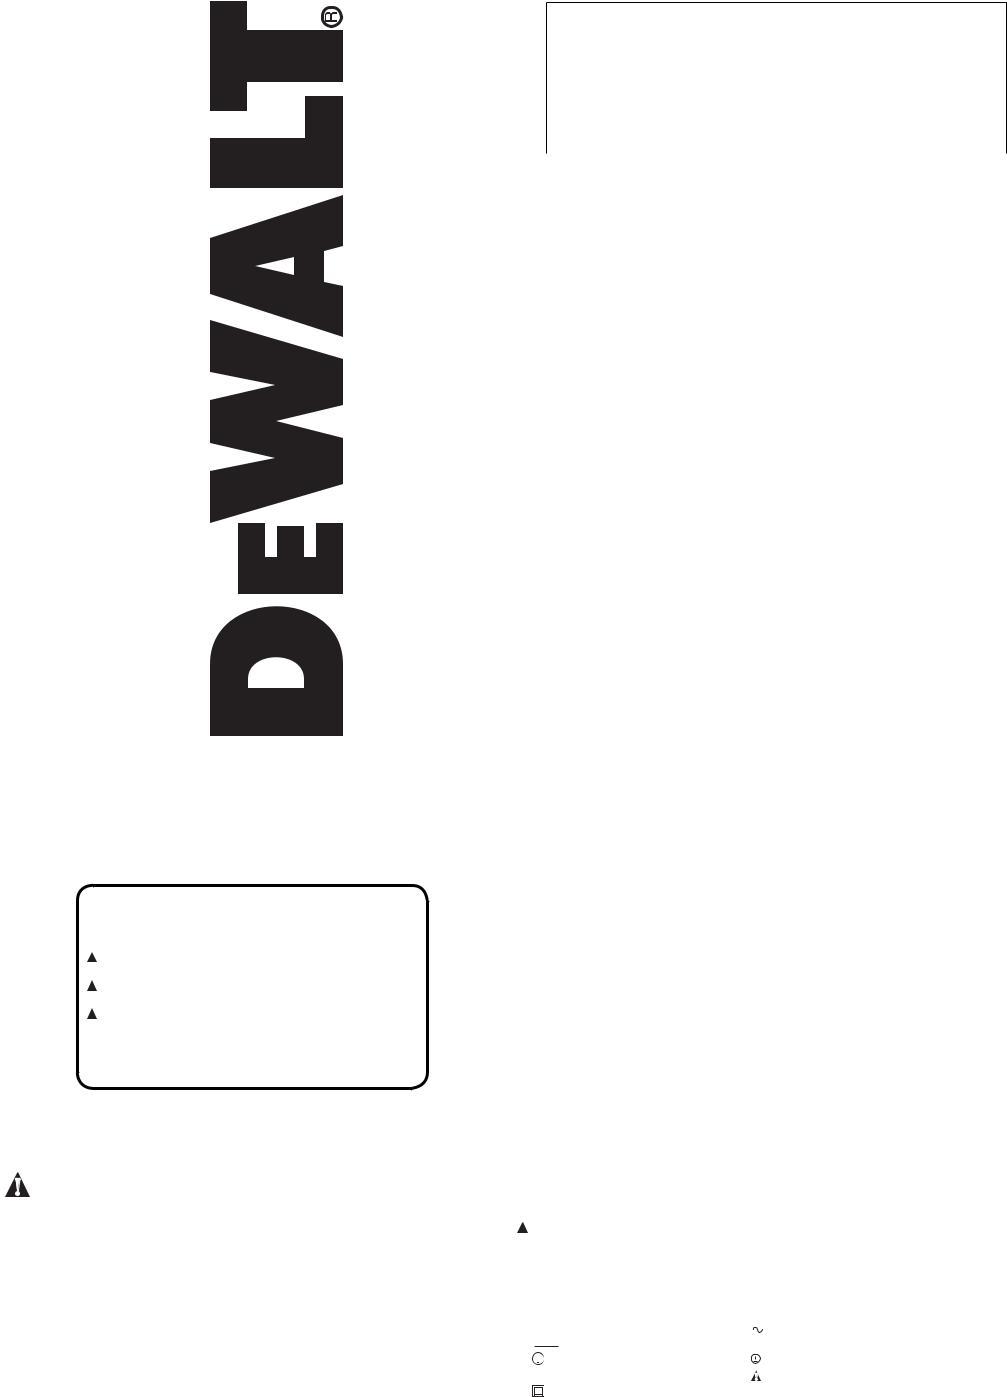 DeWalt Type 1 D21008, DWD112 User Manual